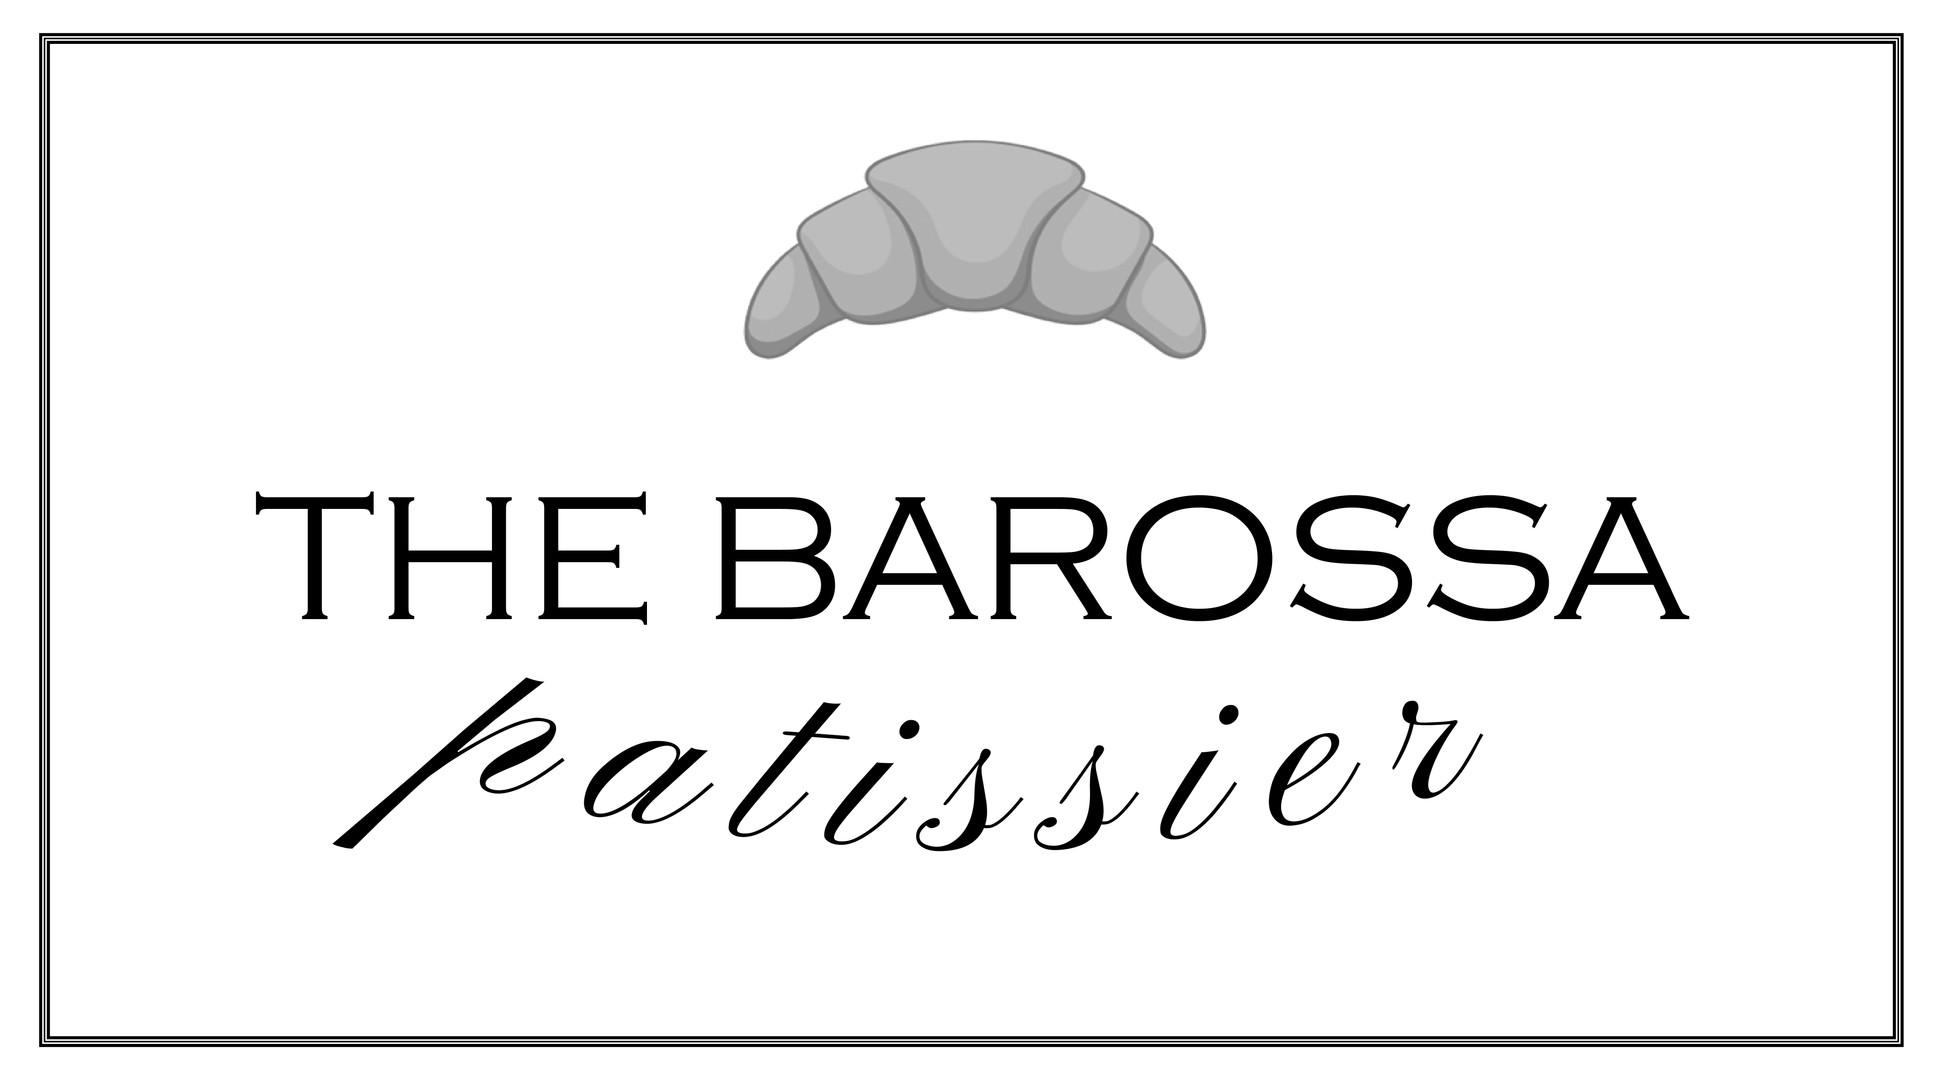 The Barossa Patissier - Landscape.jpg